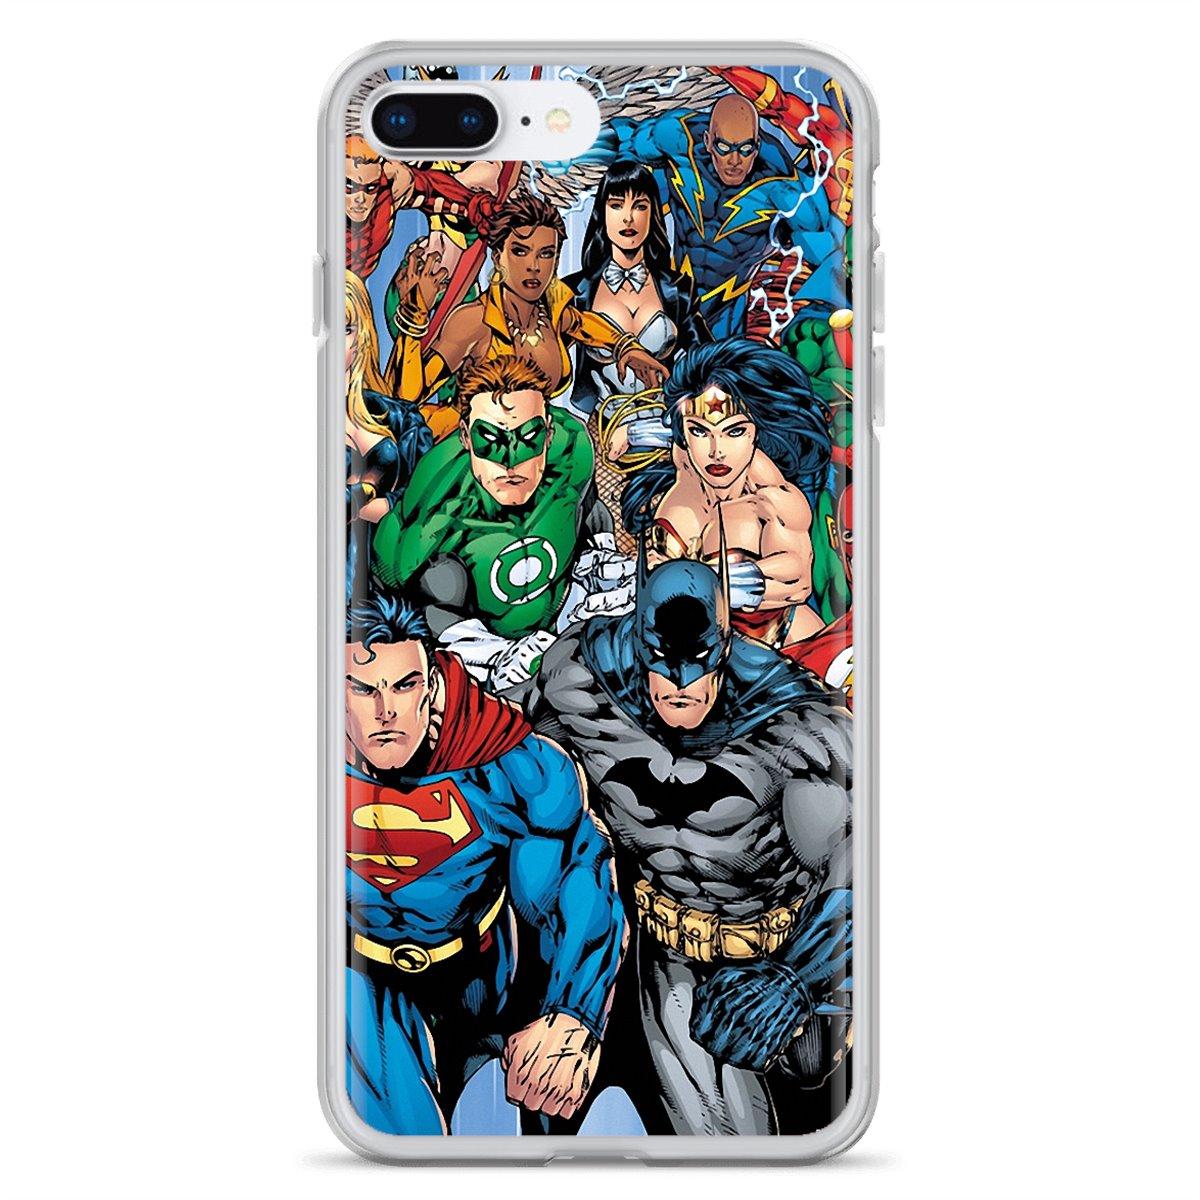 Dc Comics The Joker All Heroes Comics Silicone Phone Case For Motorola Moto G G2 G3 X4 E4 E5 G5 G5S G6 Z Z2 Z3 C Play Plus